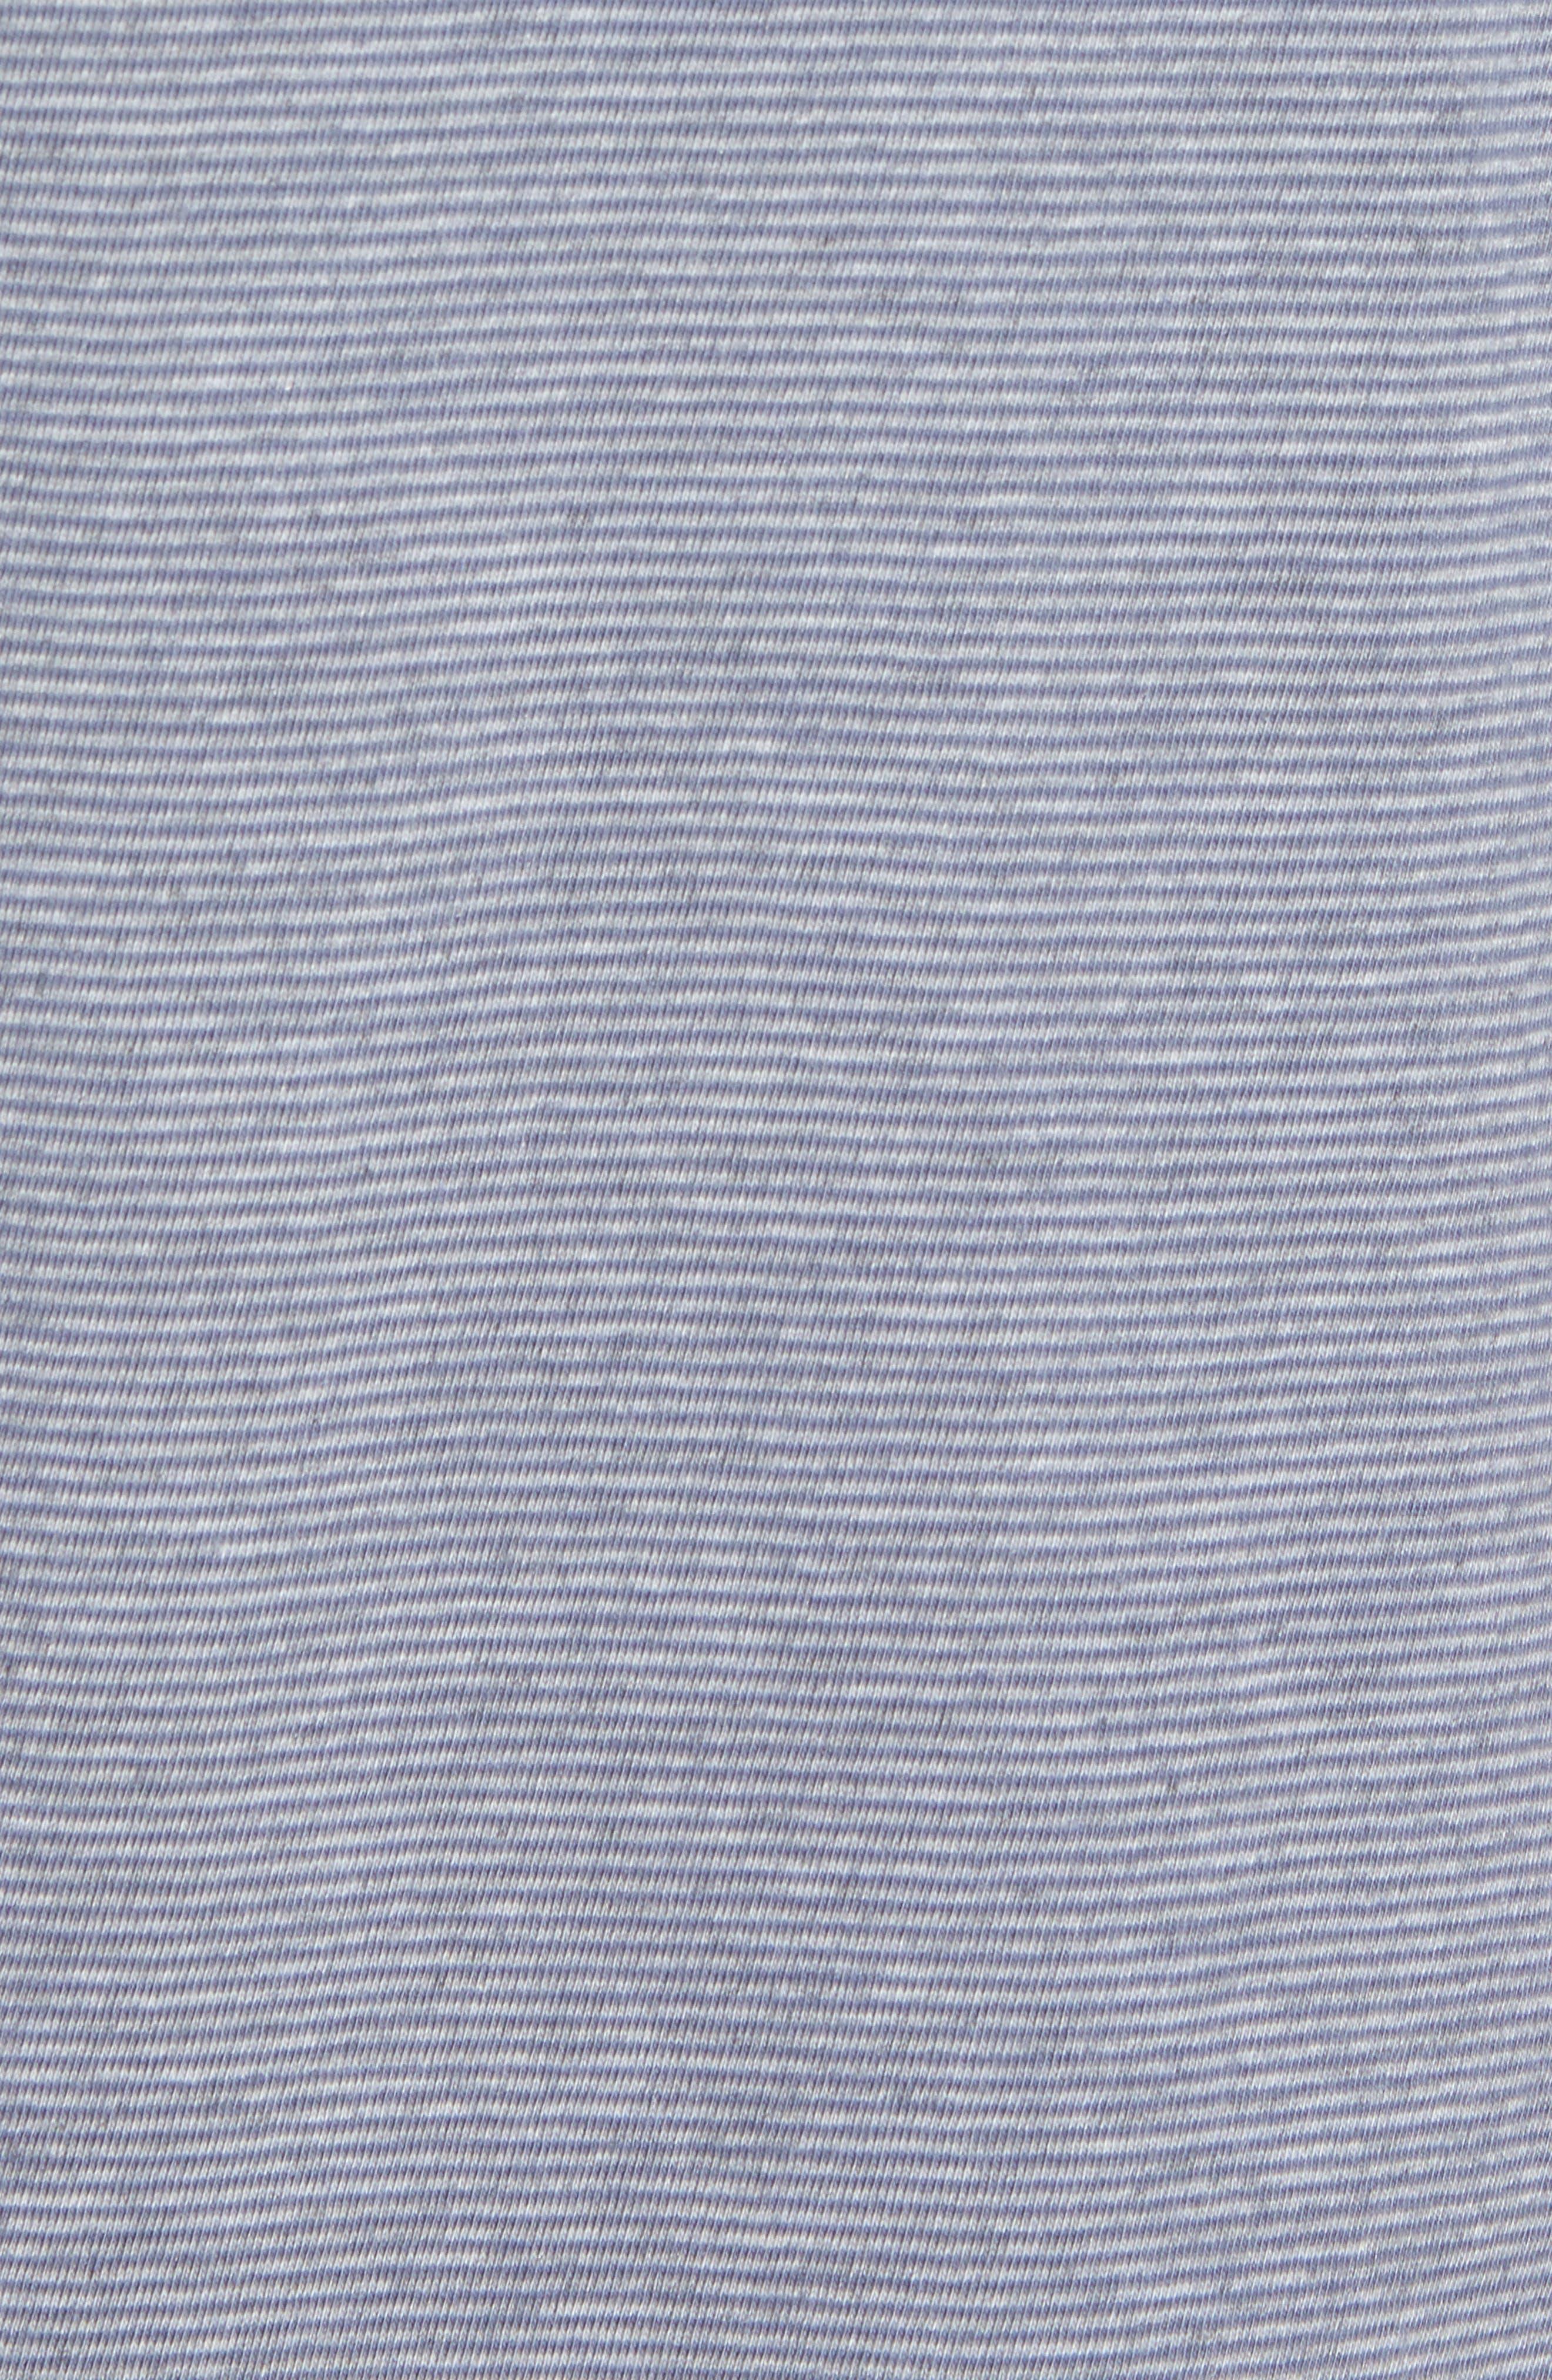 JQ Regular Fit Stripe Polo,                             Alternate thumbnail 15, color,